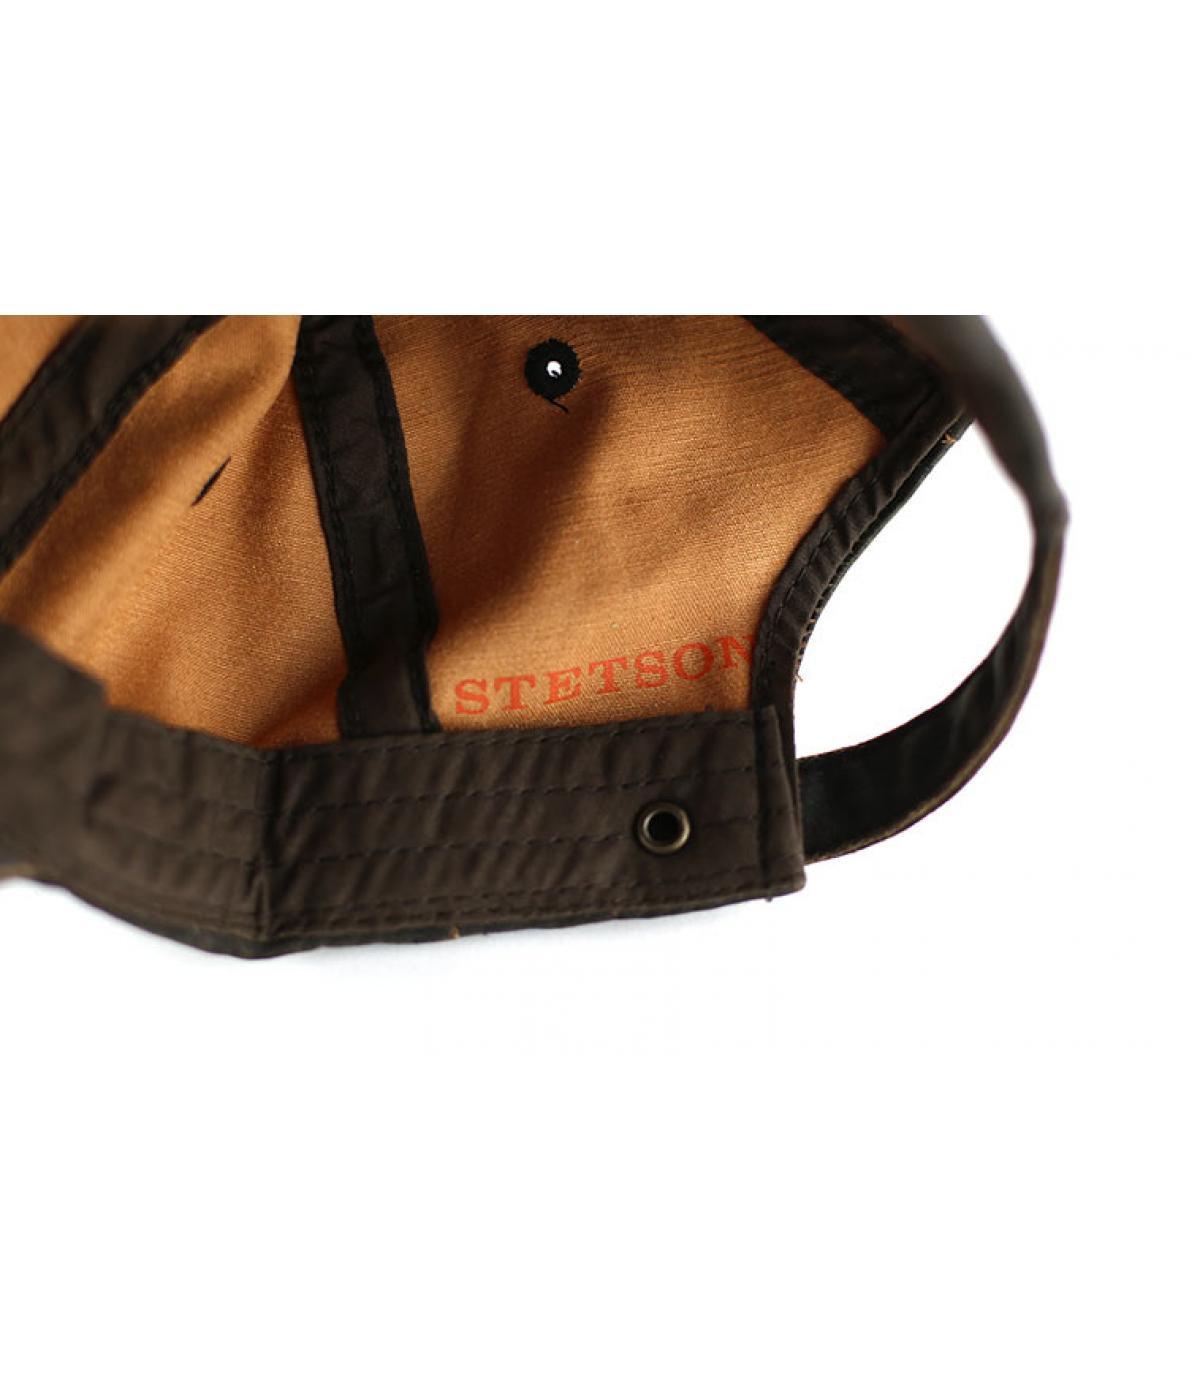 Details Statesboro brown - Abbildung 7